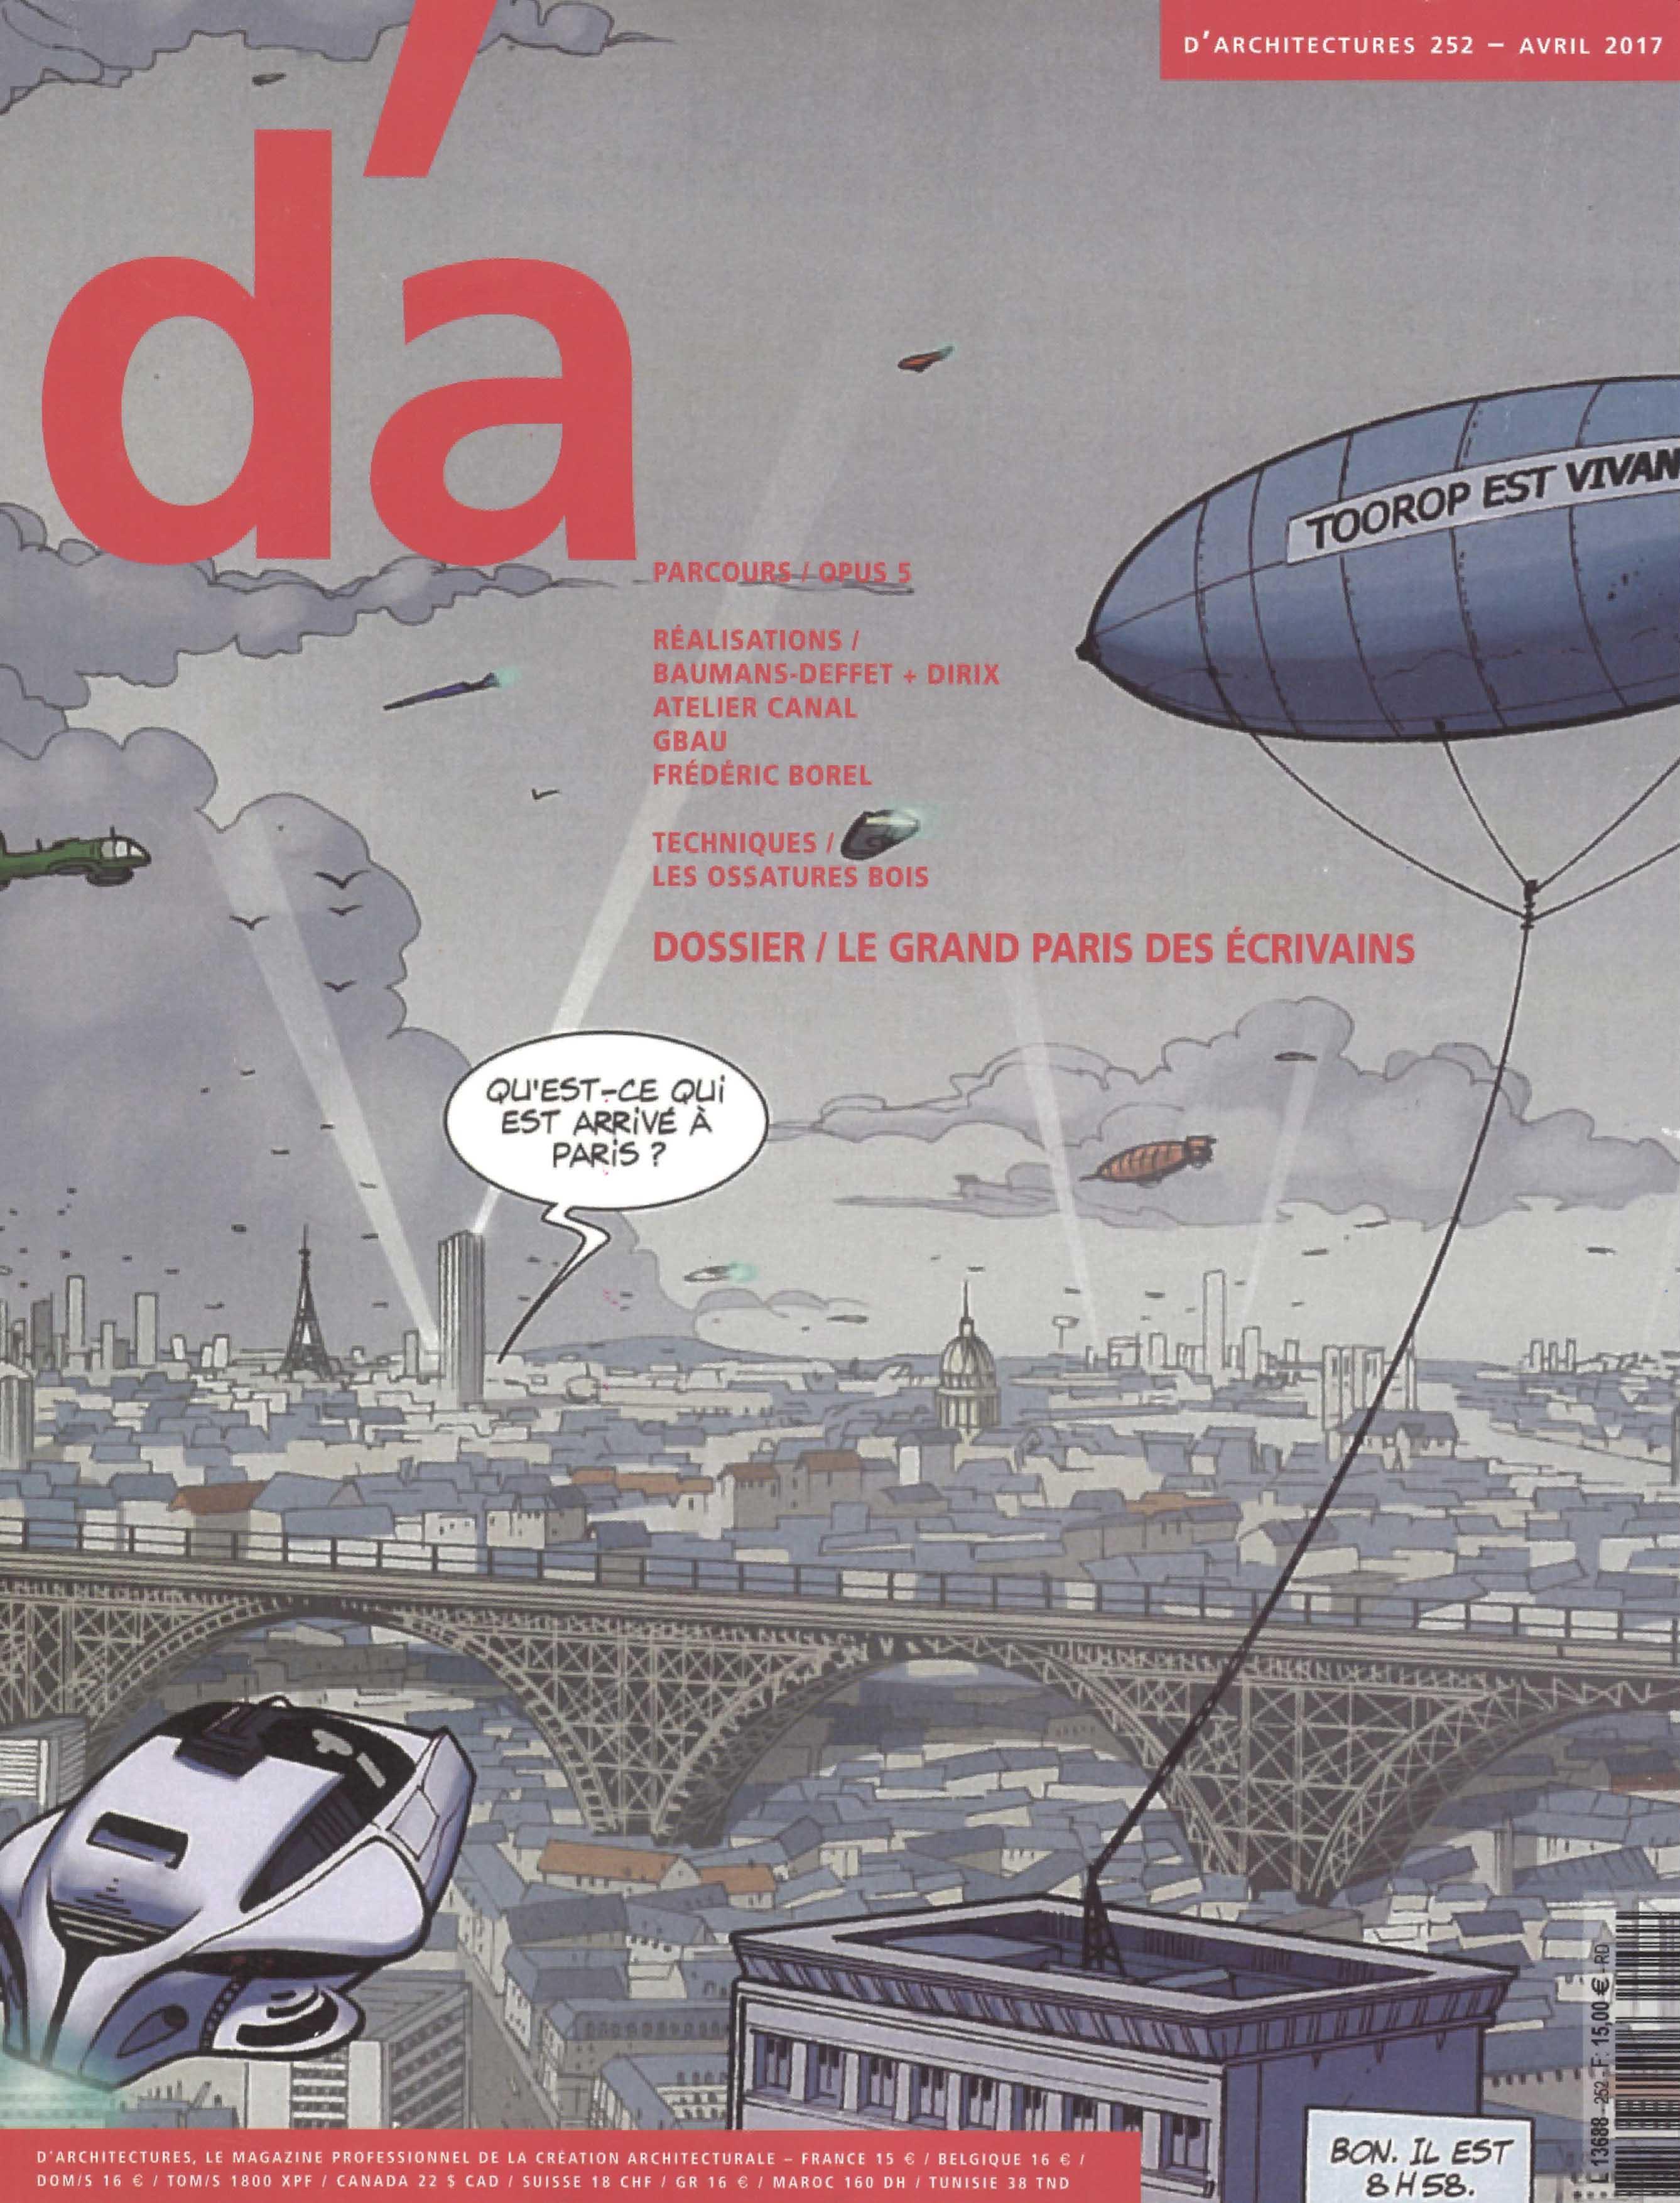 170411-DA-La Cite pdg